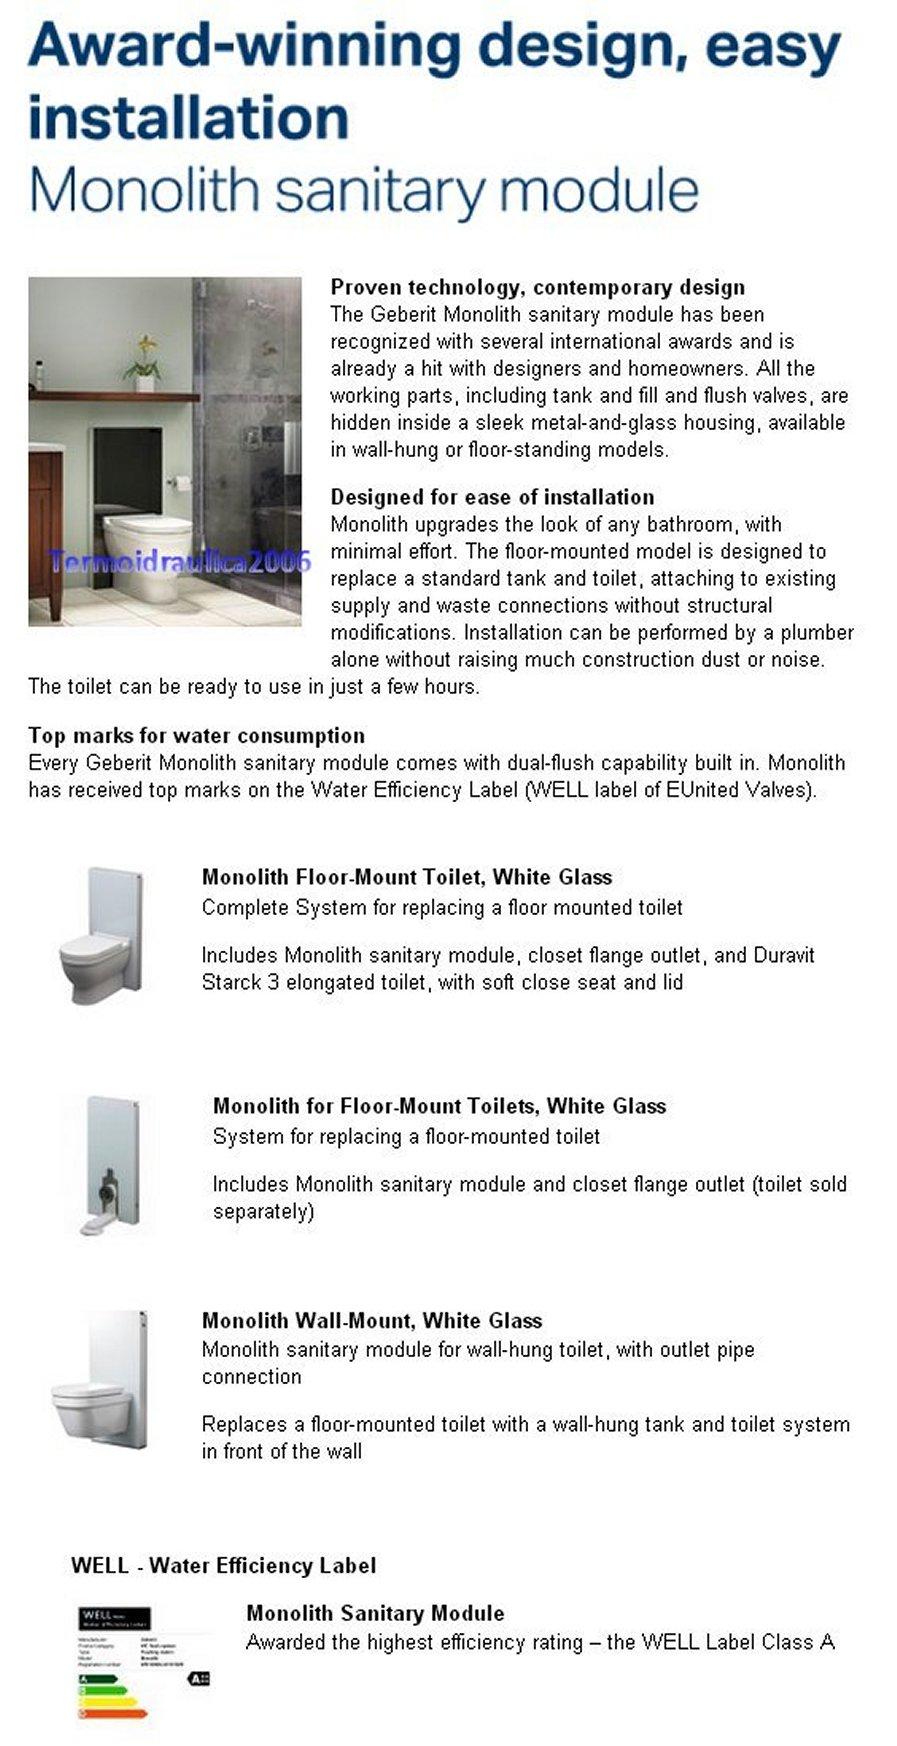 Geberit Monolith 131 030 Si 1 Monolith Sanitary Module Z1